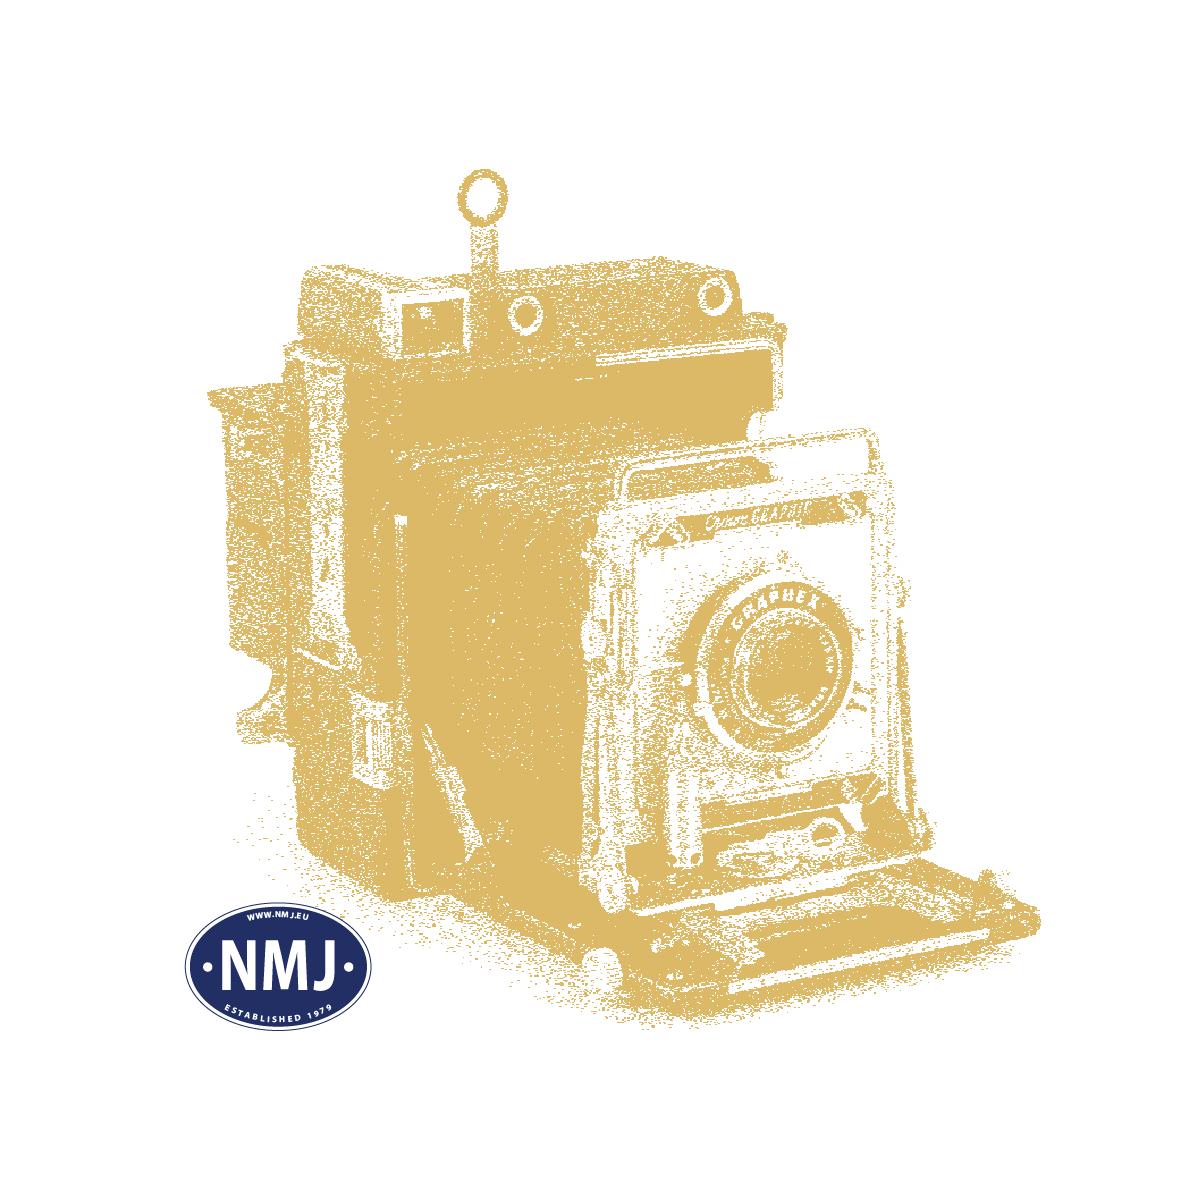 NMJT504.501 - NMJ Topline His 210 2 773-9 Gpterwagen der NSB